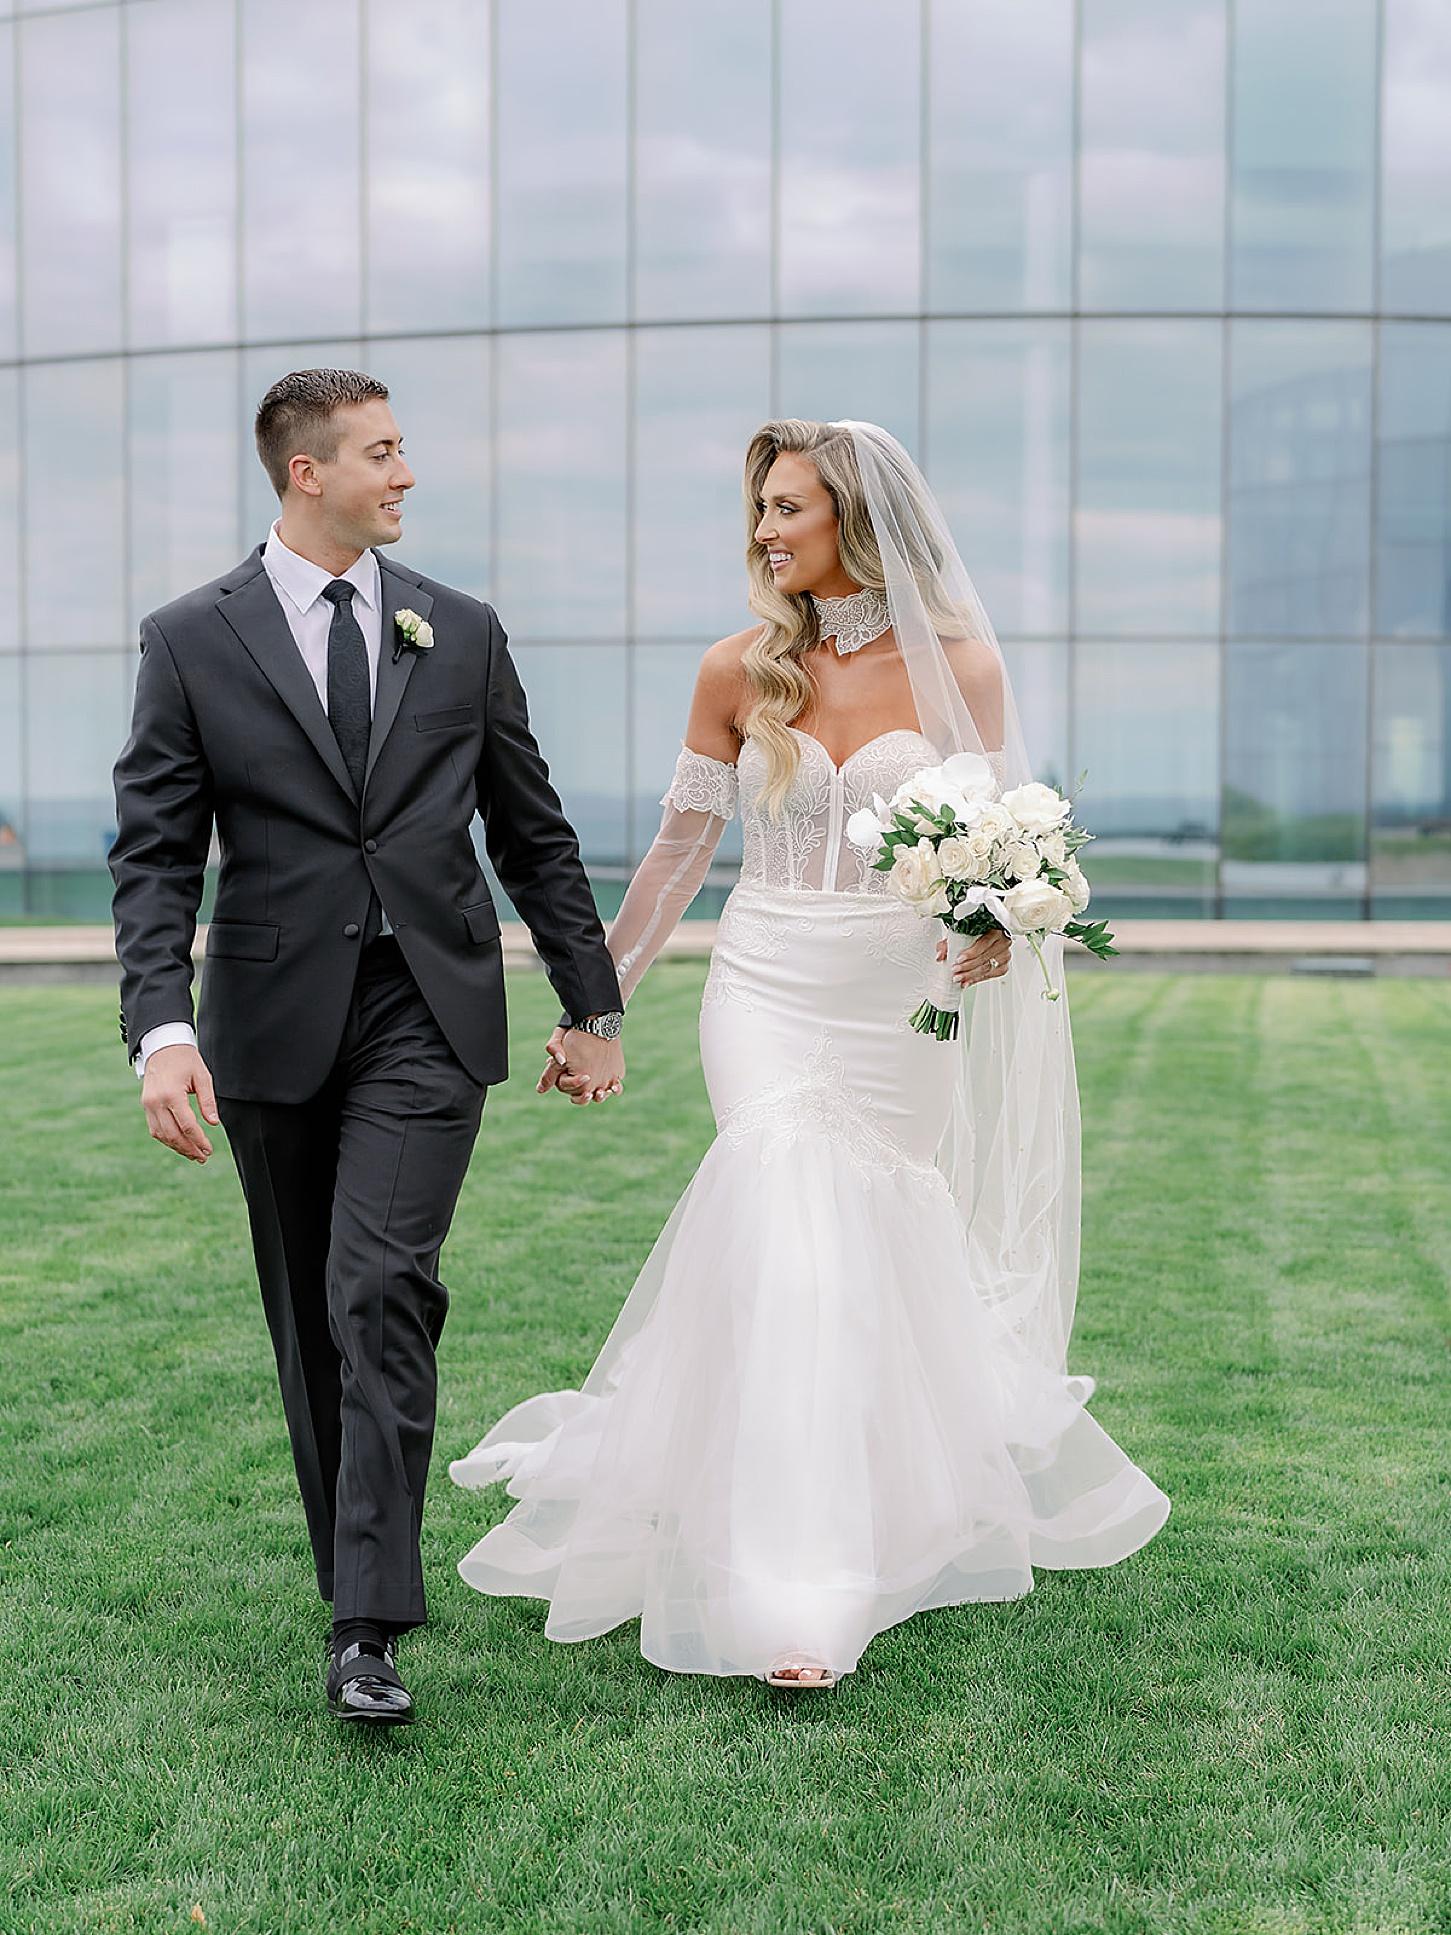 Atlantic City Wedding Photography Studio by Magdalena Studios Lexy Cha 0072